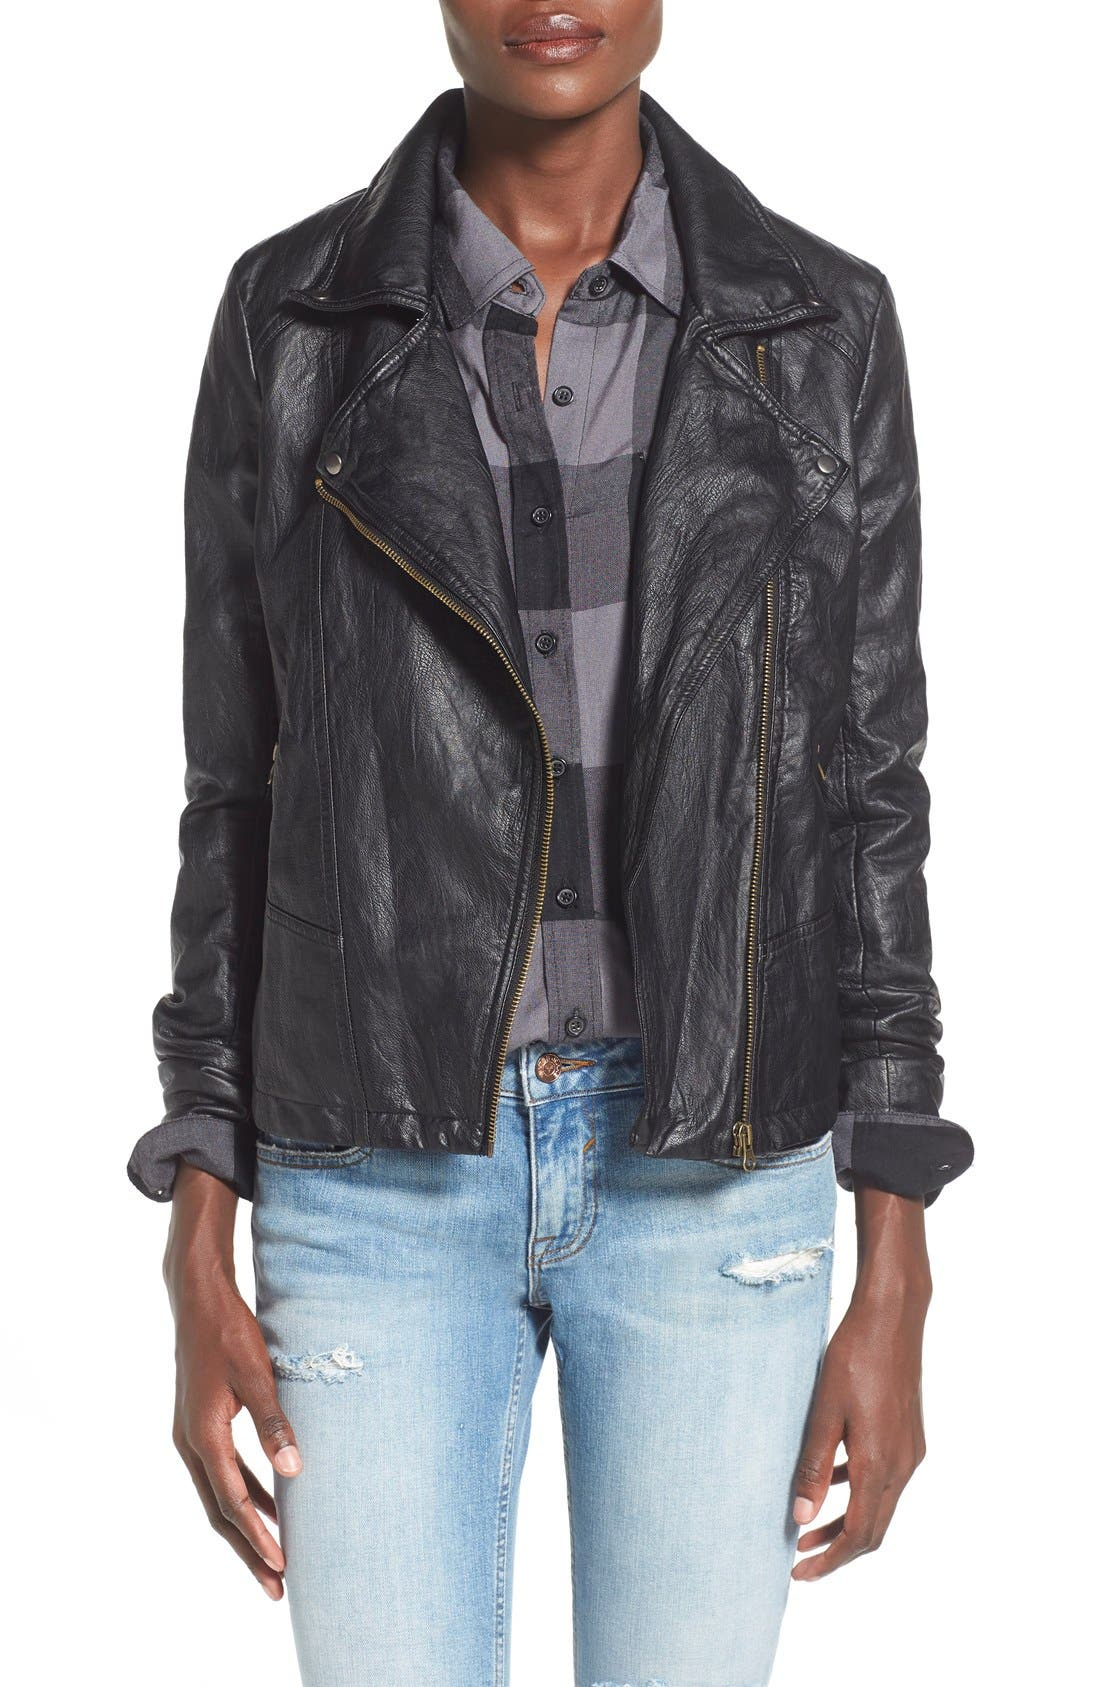 SUN & SHADOW, Faux Leather Moto Jacket, Main thumbnail 1, color, 001